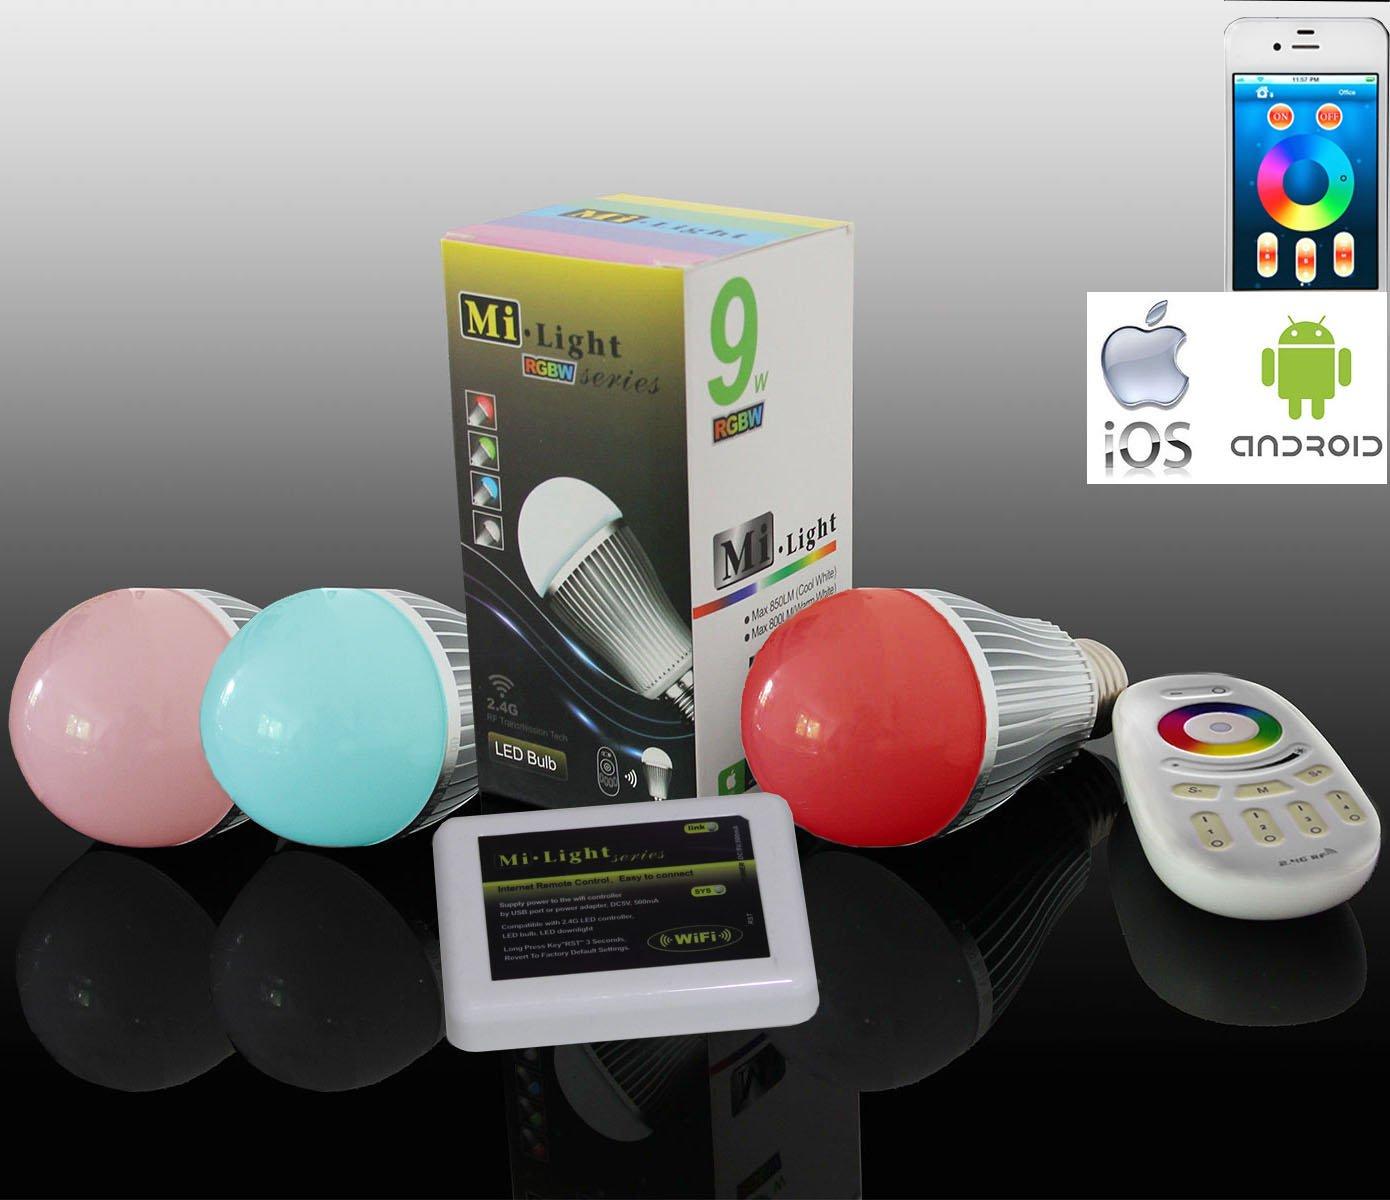 3x WLAN LED Lampe original LIGHTEU@ Farbe RGB- Warm Weiß, 9 Watt, E27, dimmbar, mit 4 zone Fernbedienung, Farbwechsel Glühbirne, inkl. WLAN Controller steuerbar über IPhone   Android App, 2 stk. VARTA AAA 1,5V Batterie